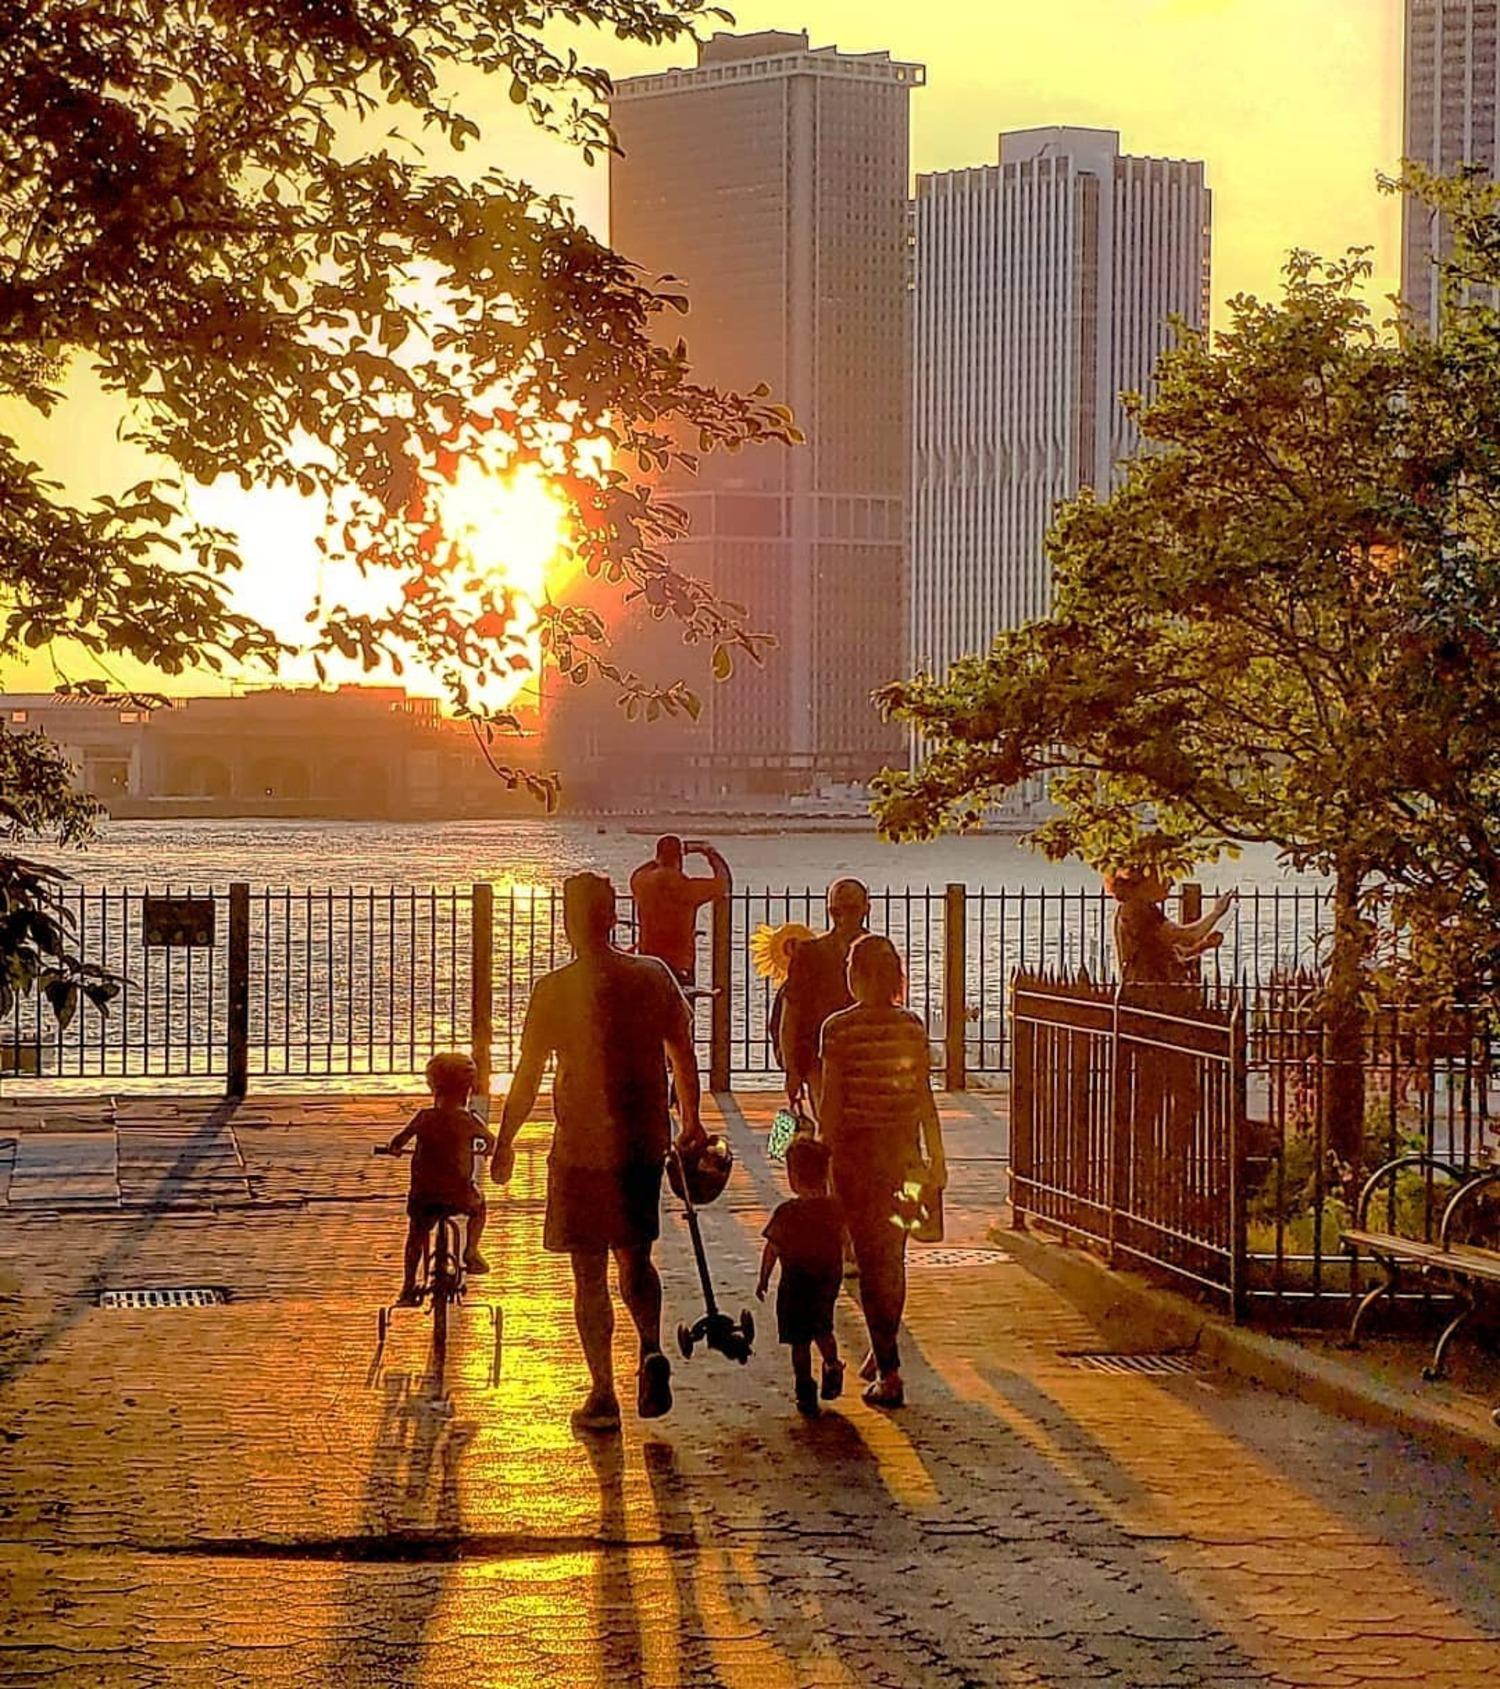 Sunset over Lower Manhattan skyline from Brooklyn Heights